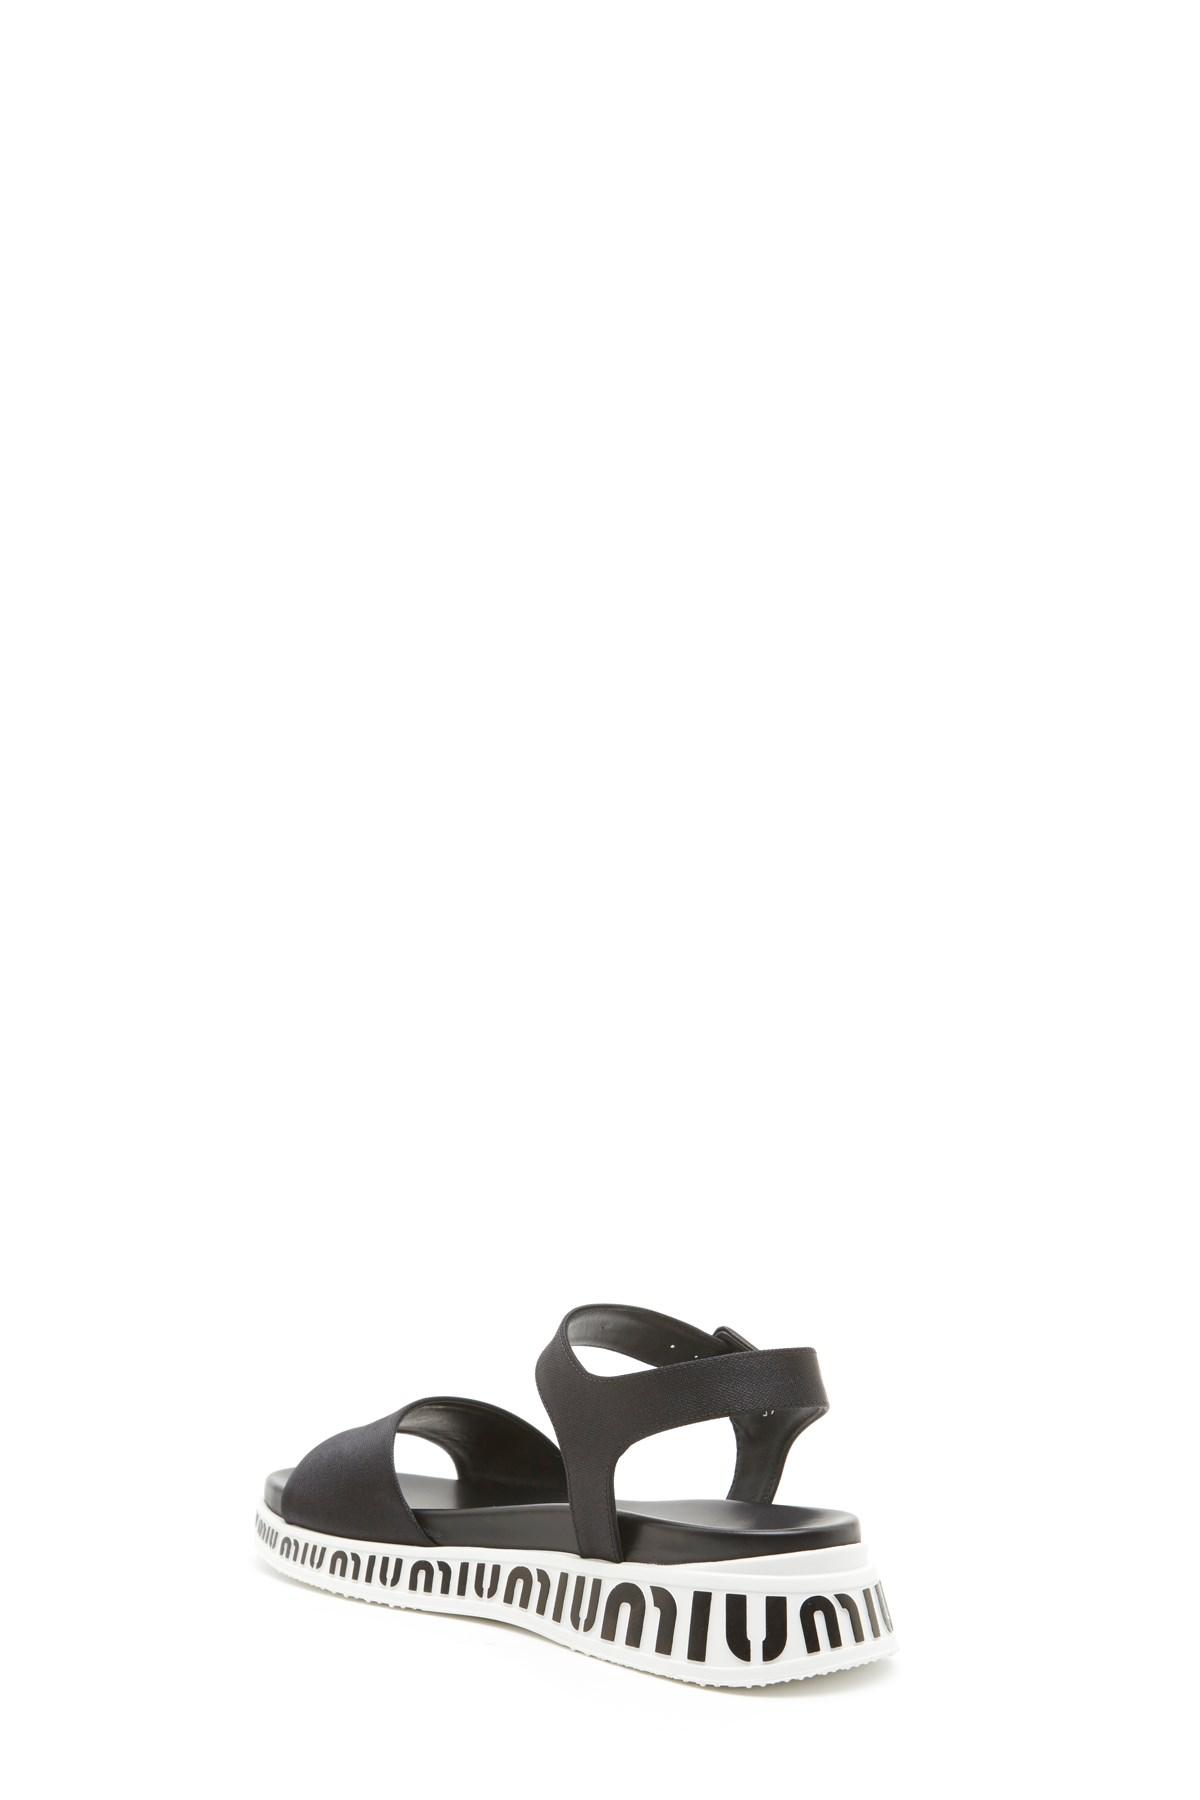 955d1eddac8 miu miu nylon tech sandals available on julian-fashion.com - 61304